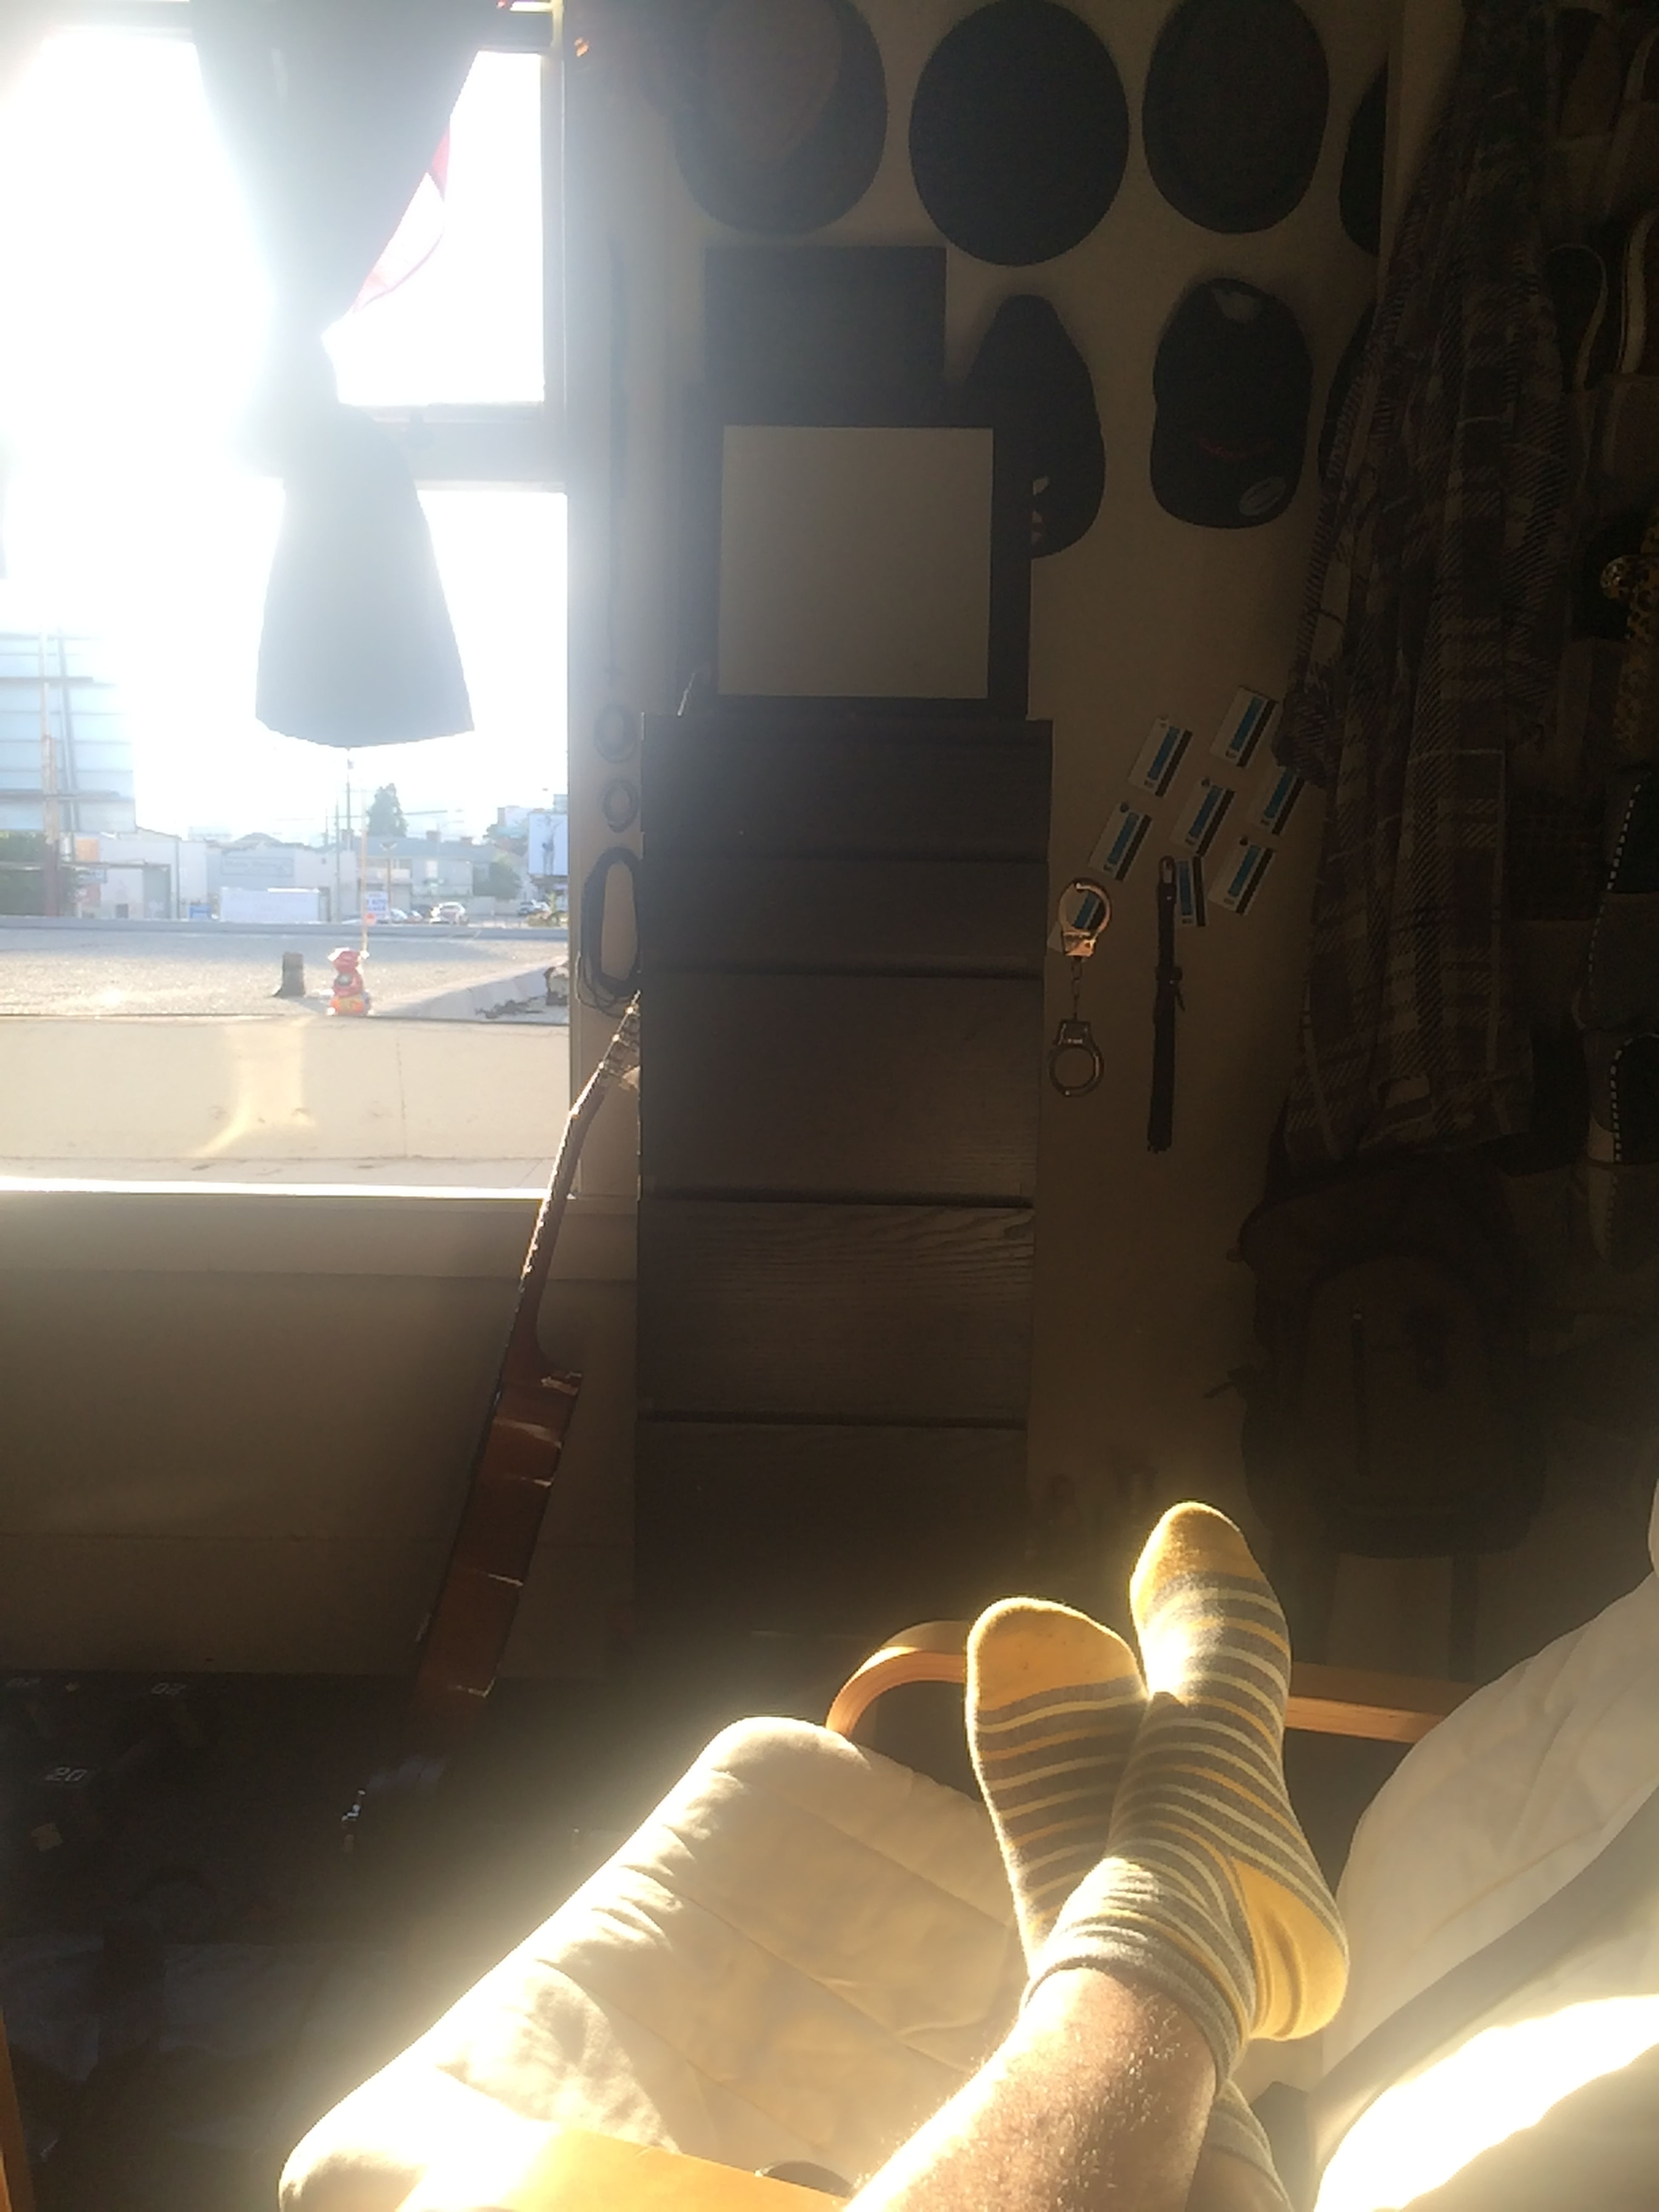 Chilling Just Chillin'